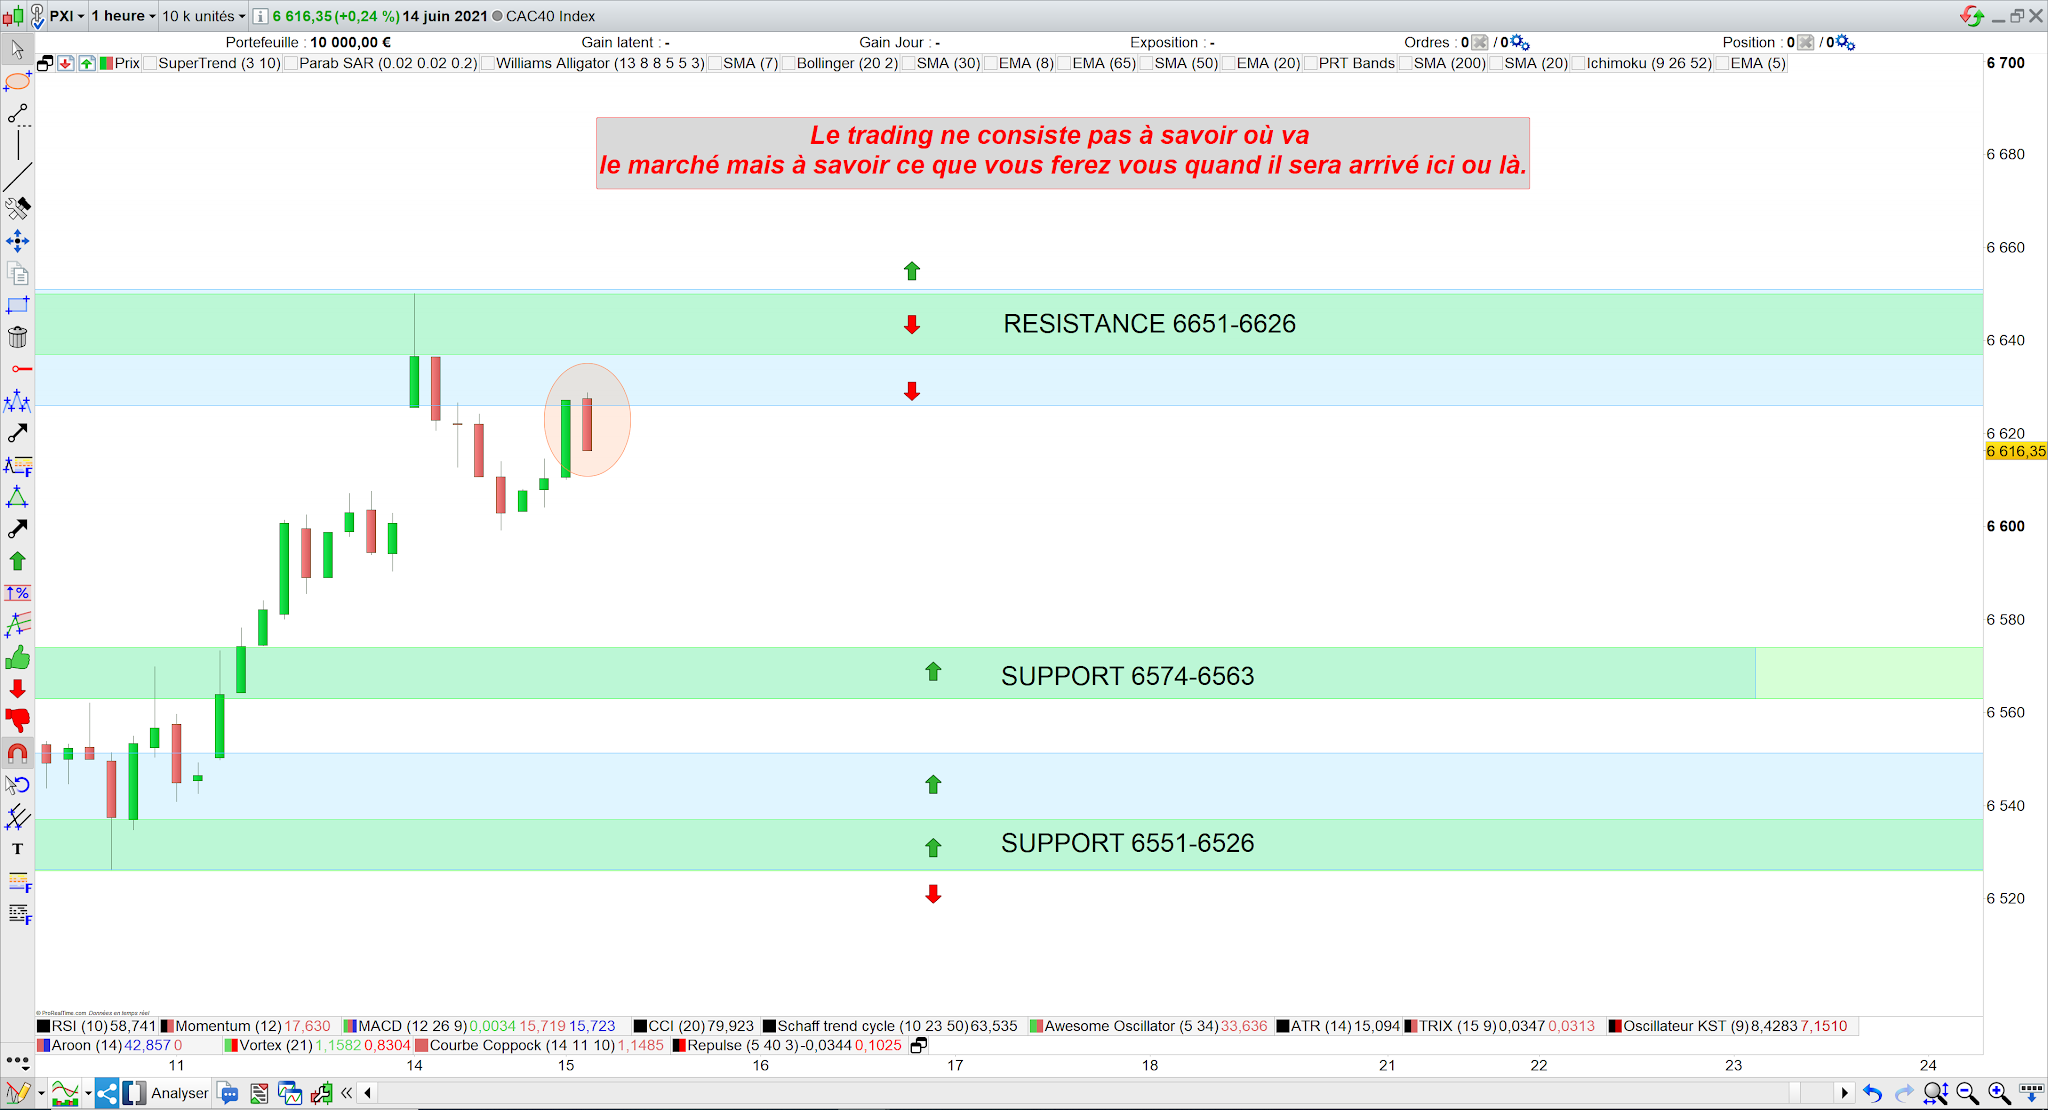 Trading cac40 15 juin 21